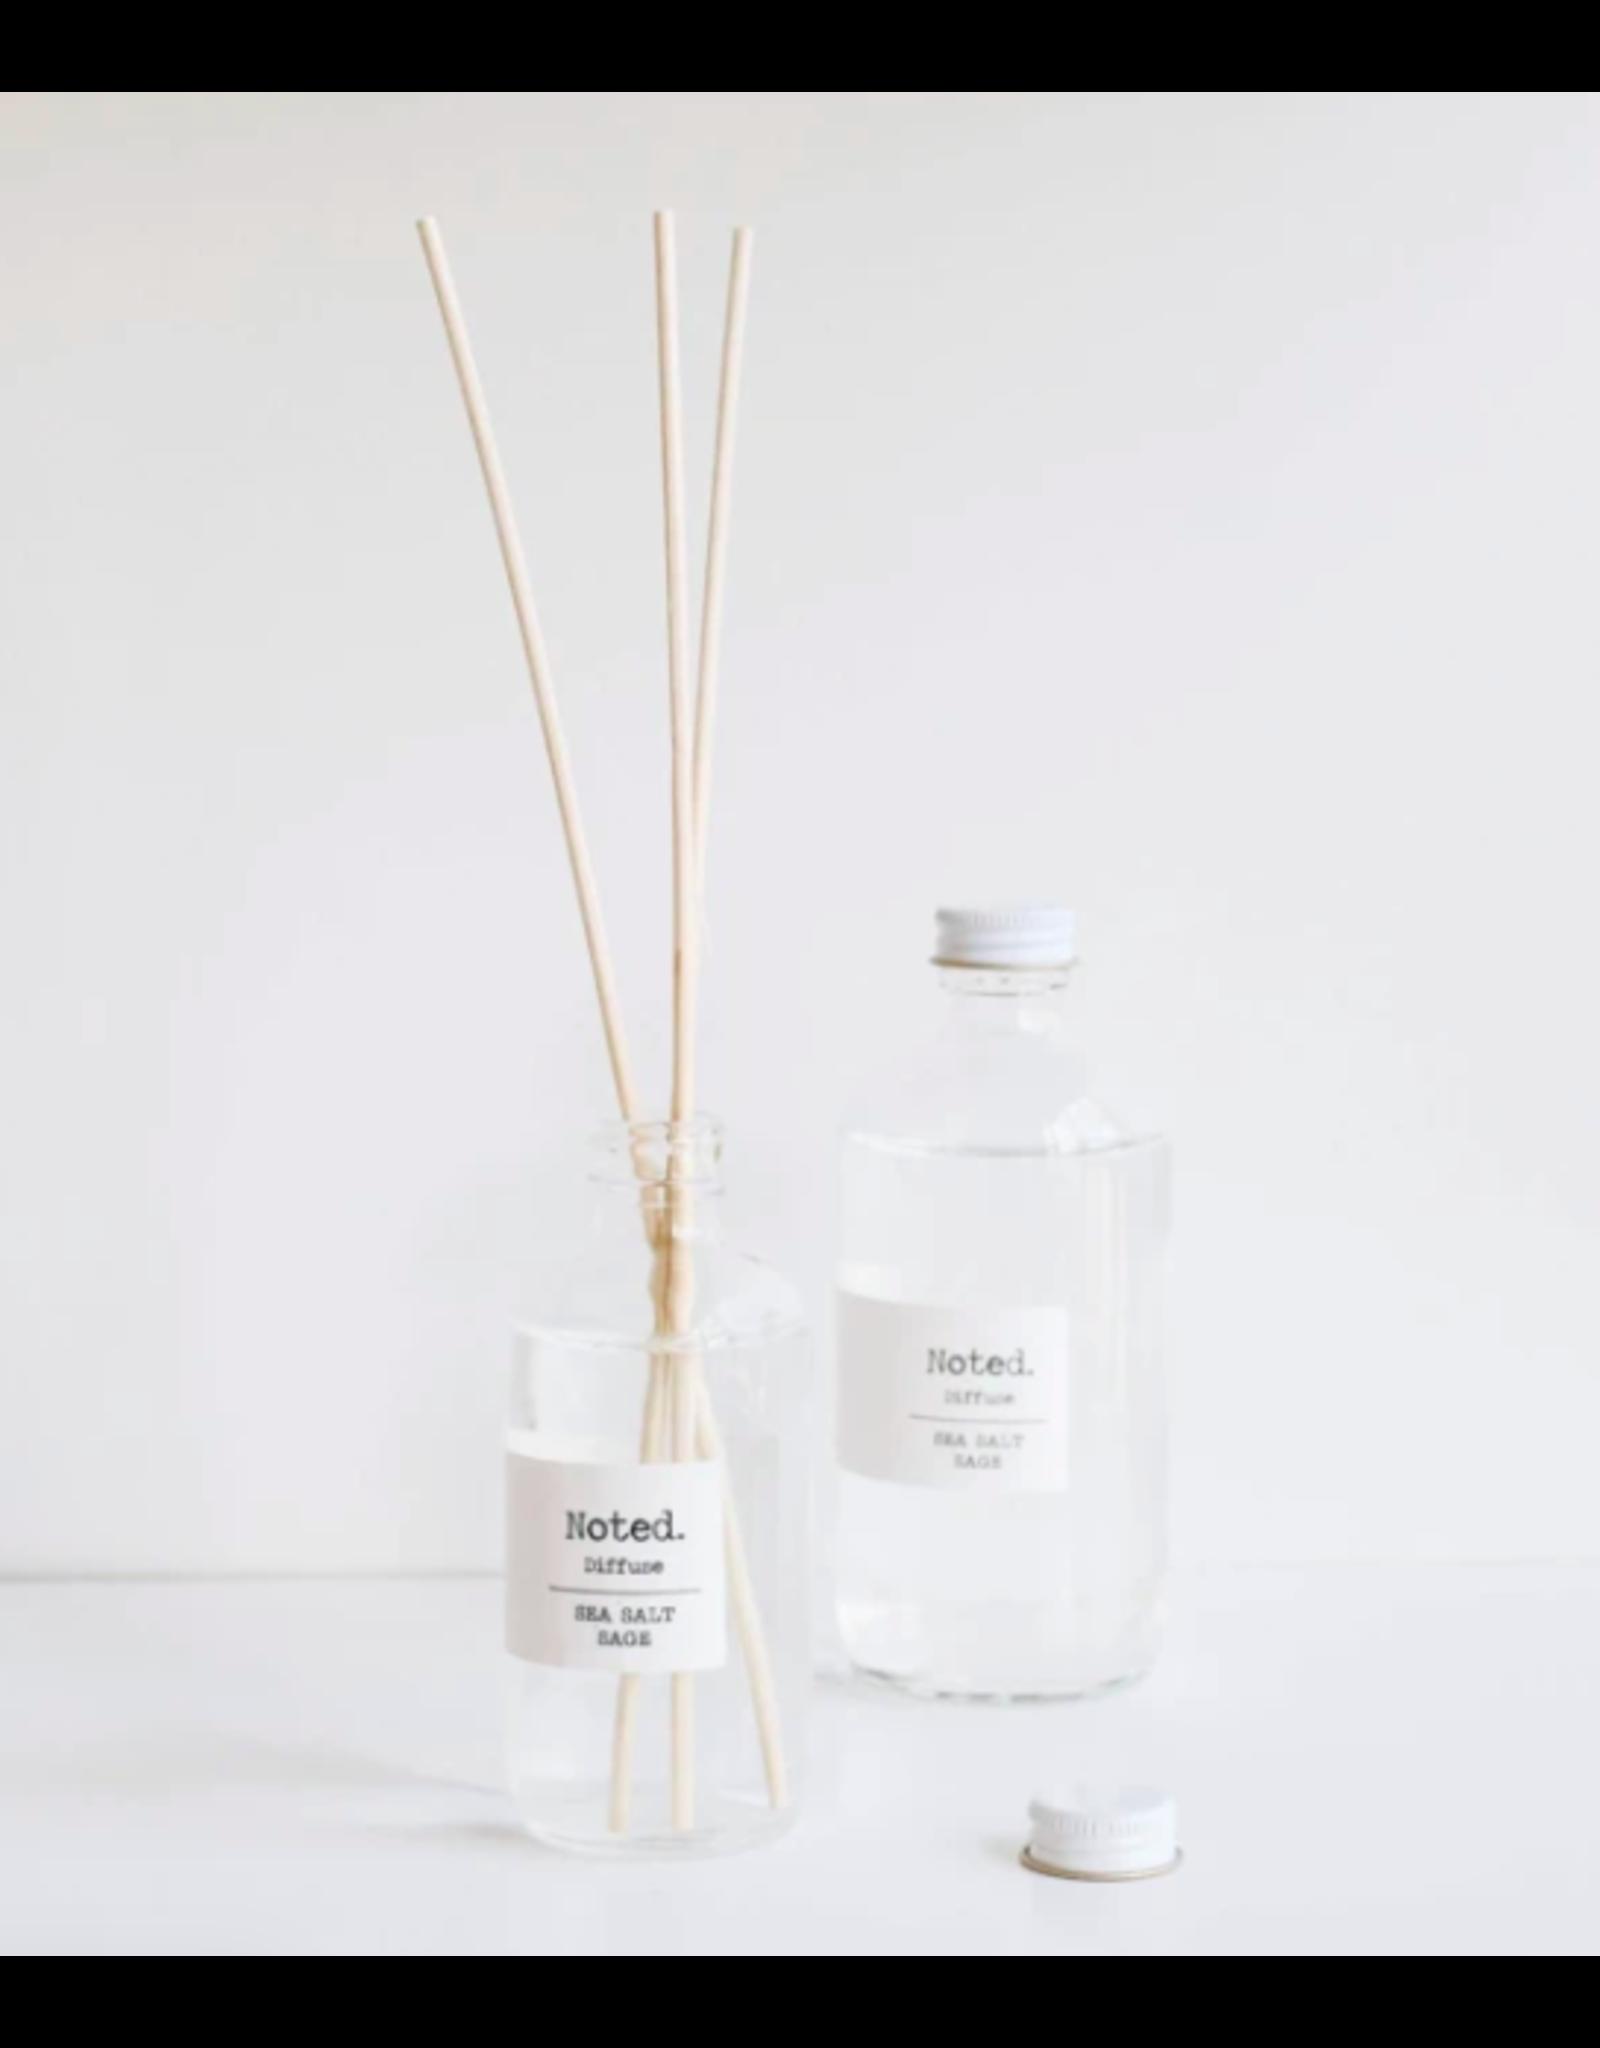 Noted Sea Salt Sage 8oz Diffuser